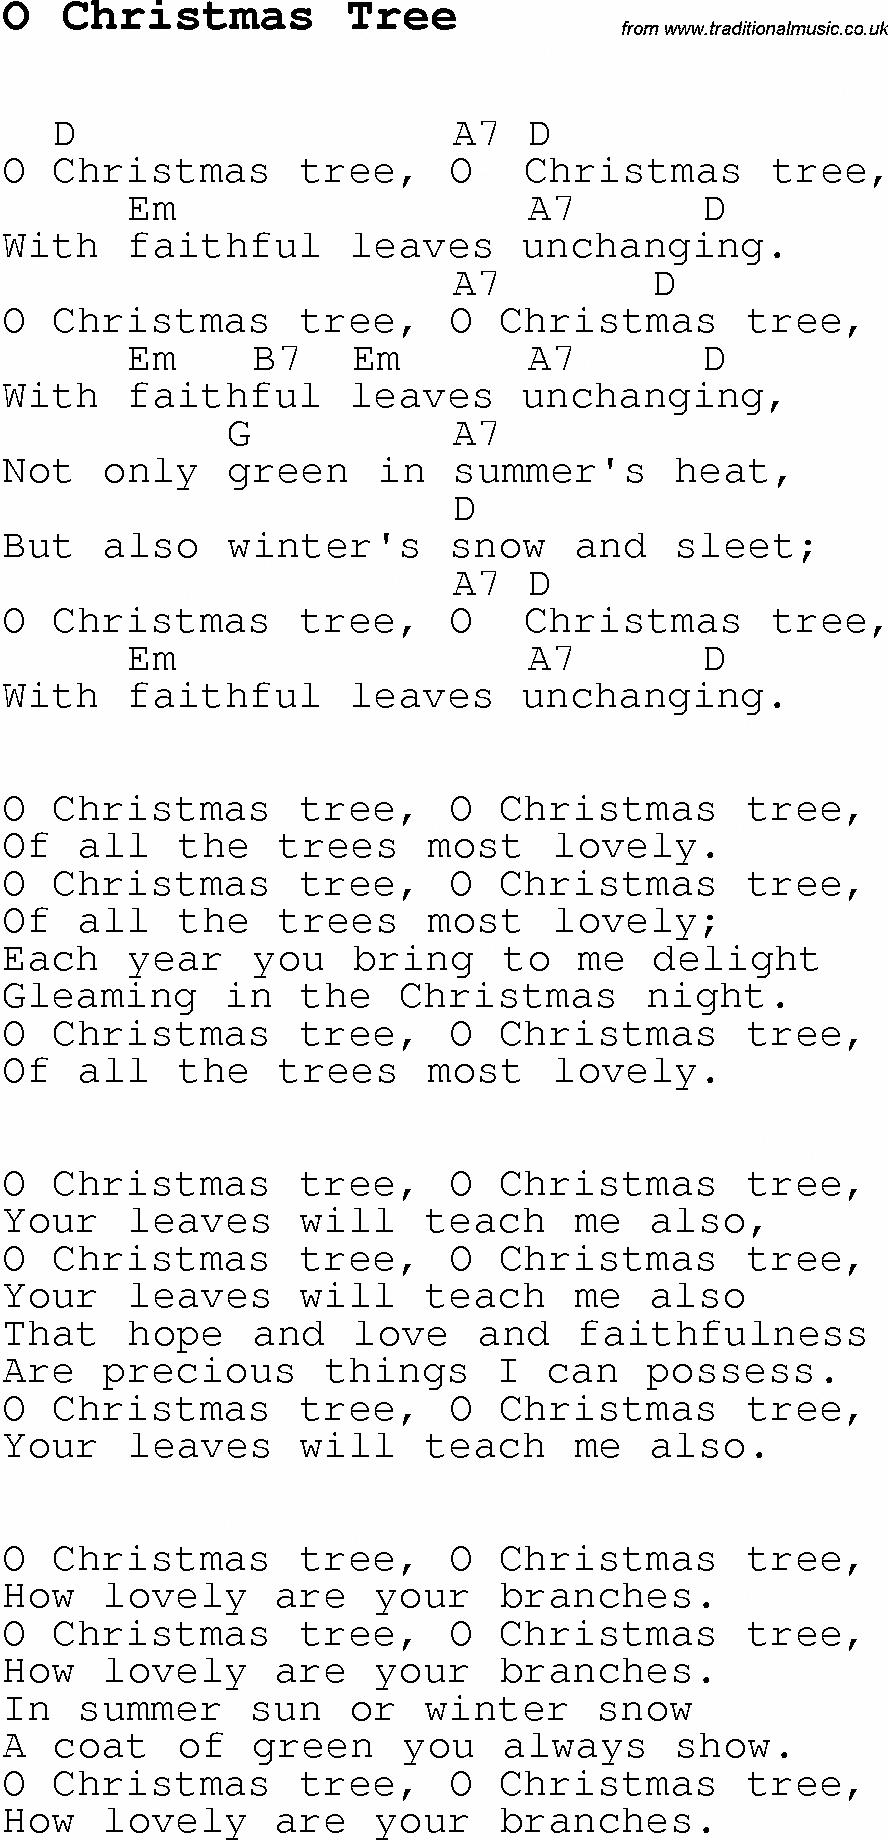 Christmas Songs And Carols Lyrics With Chords For Guitar Banjo For O Christmas Tree Learnukule Guitar Chords For Songs Ukulele Lesson Christmas Ukulele Songs